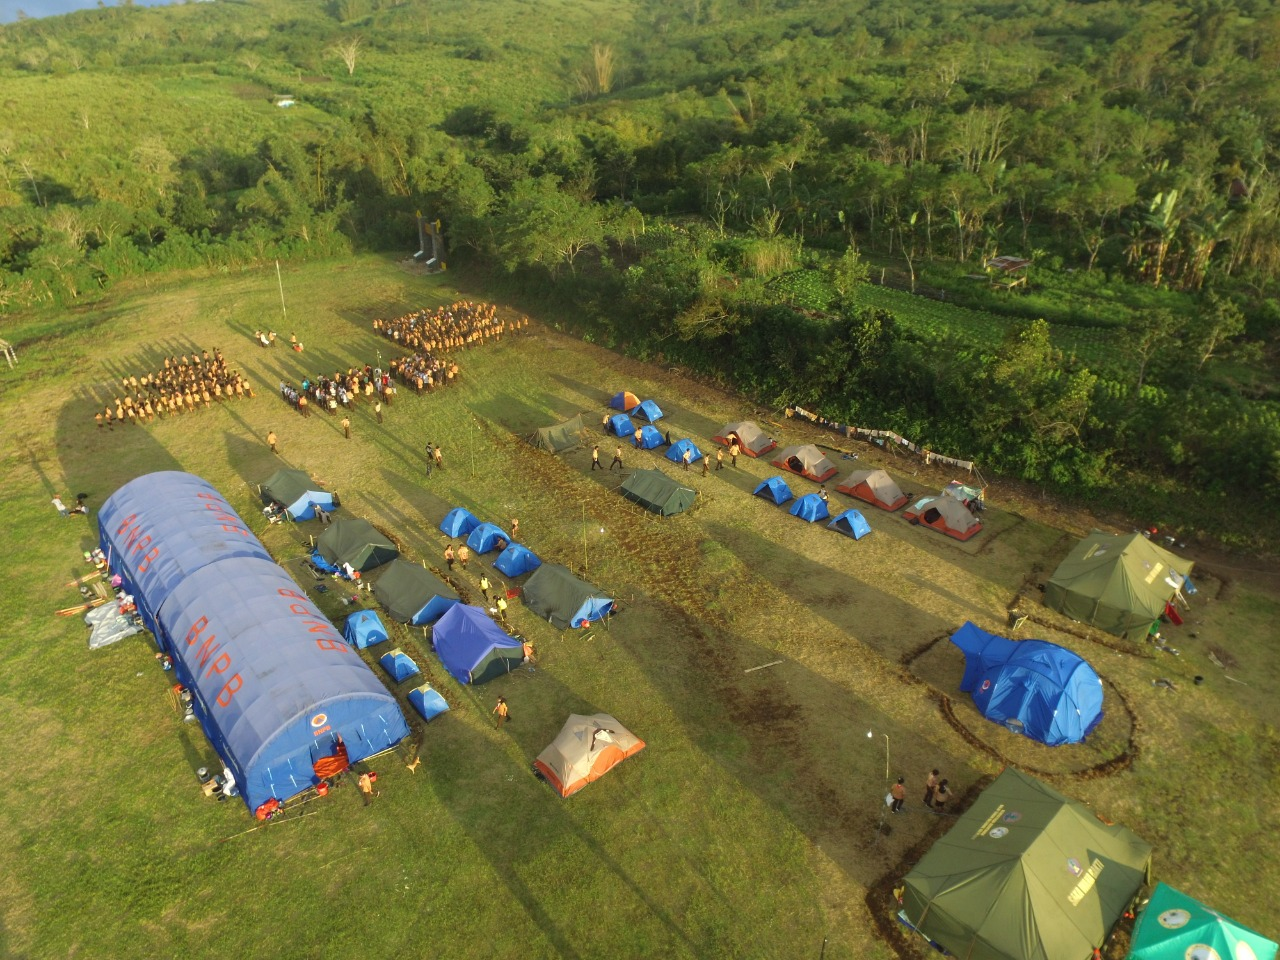 Siswa Siswai SMAK Syuradikara Berkemping di Camping Ground Desa Wologai Tengah